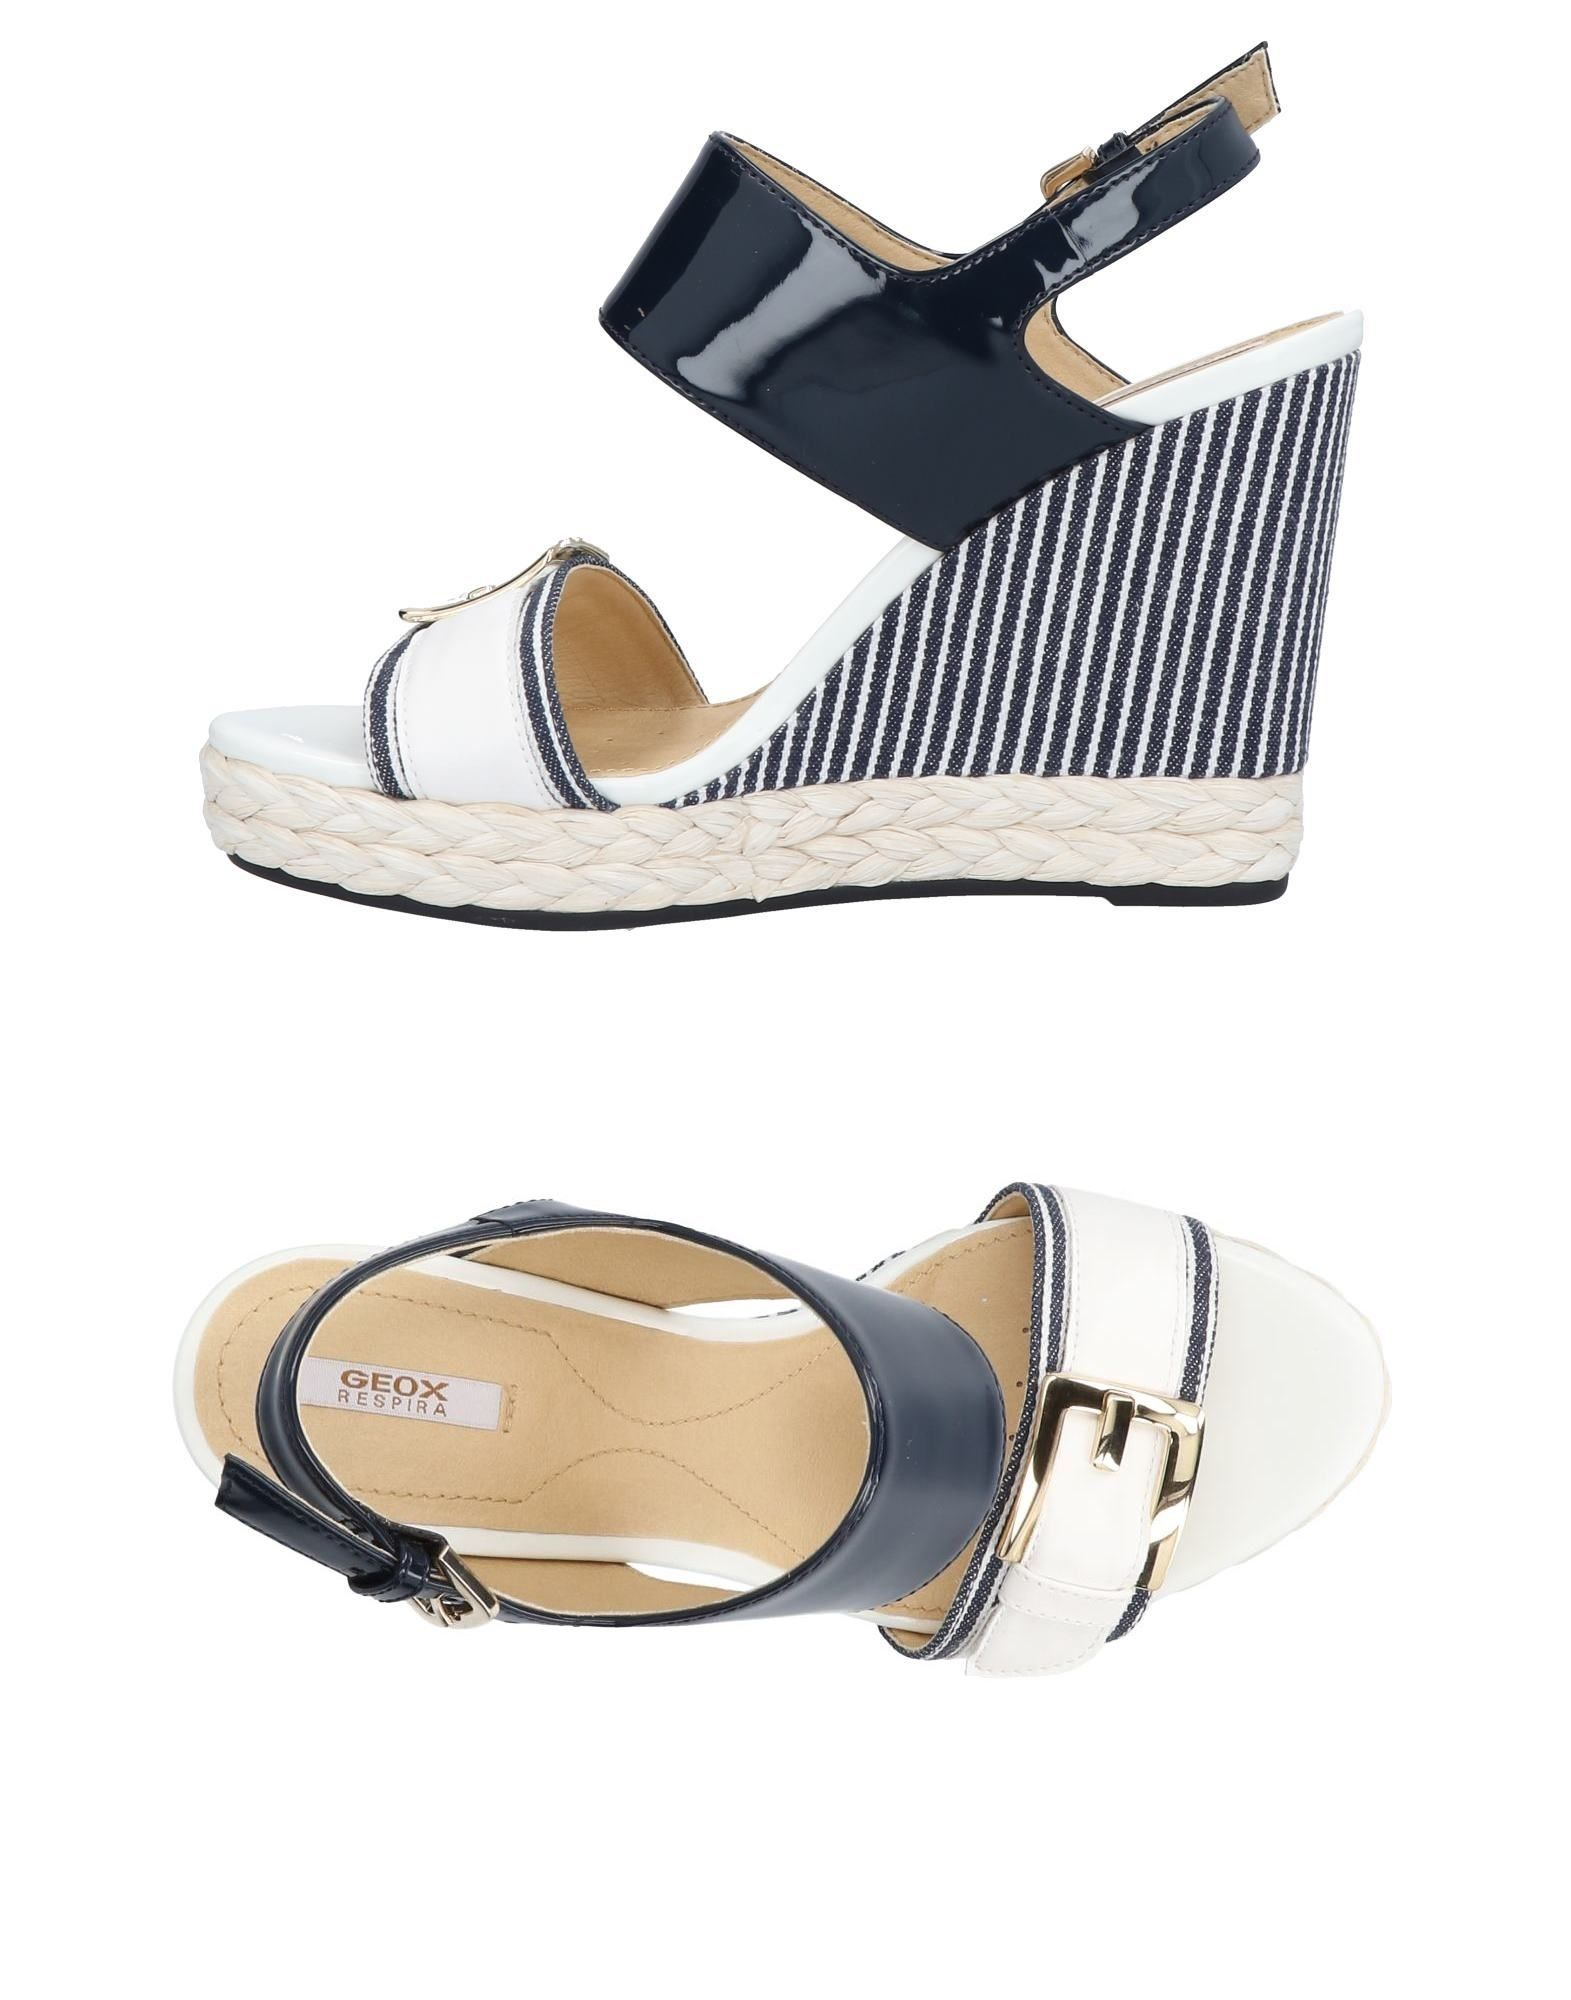 Geox  Sandals - Women Geox Sandals online on  Geox United Kingdom - 11453365HW 5a0988